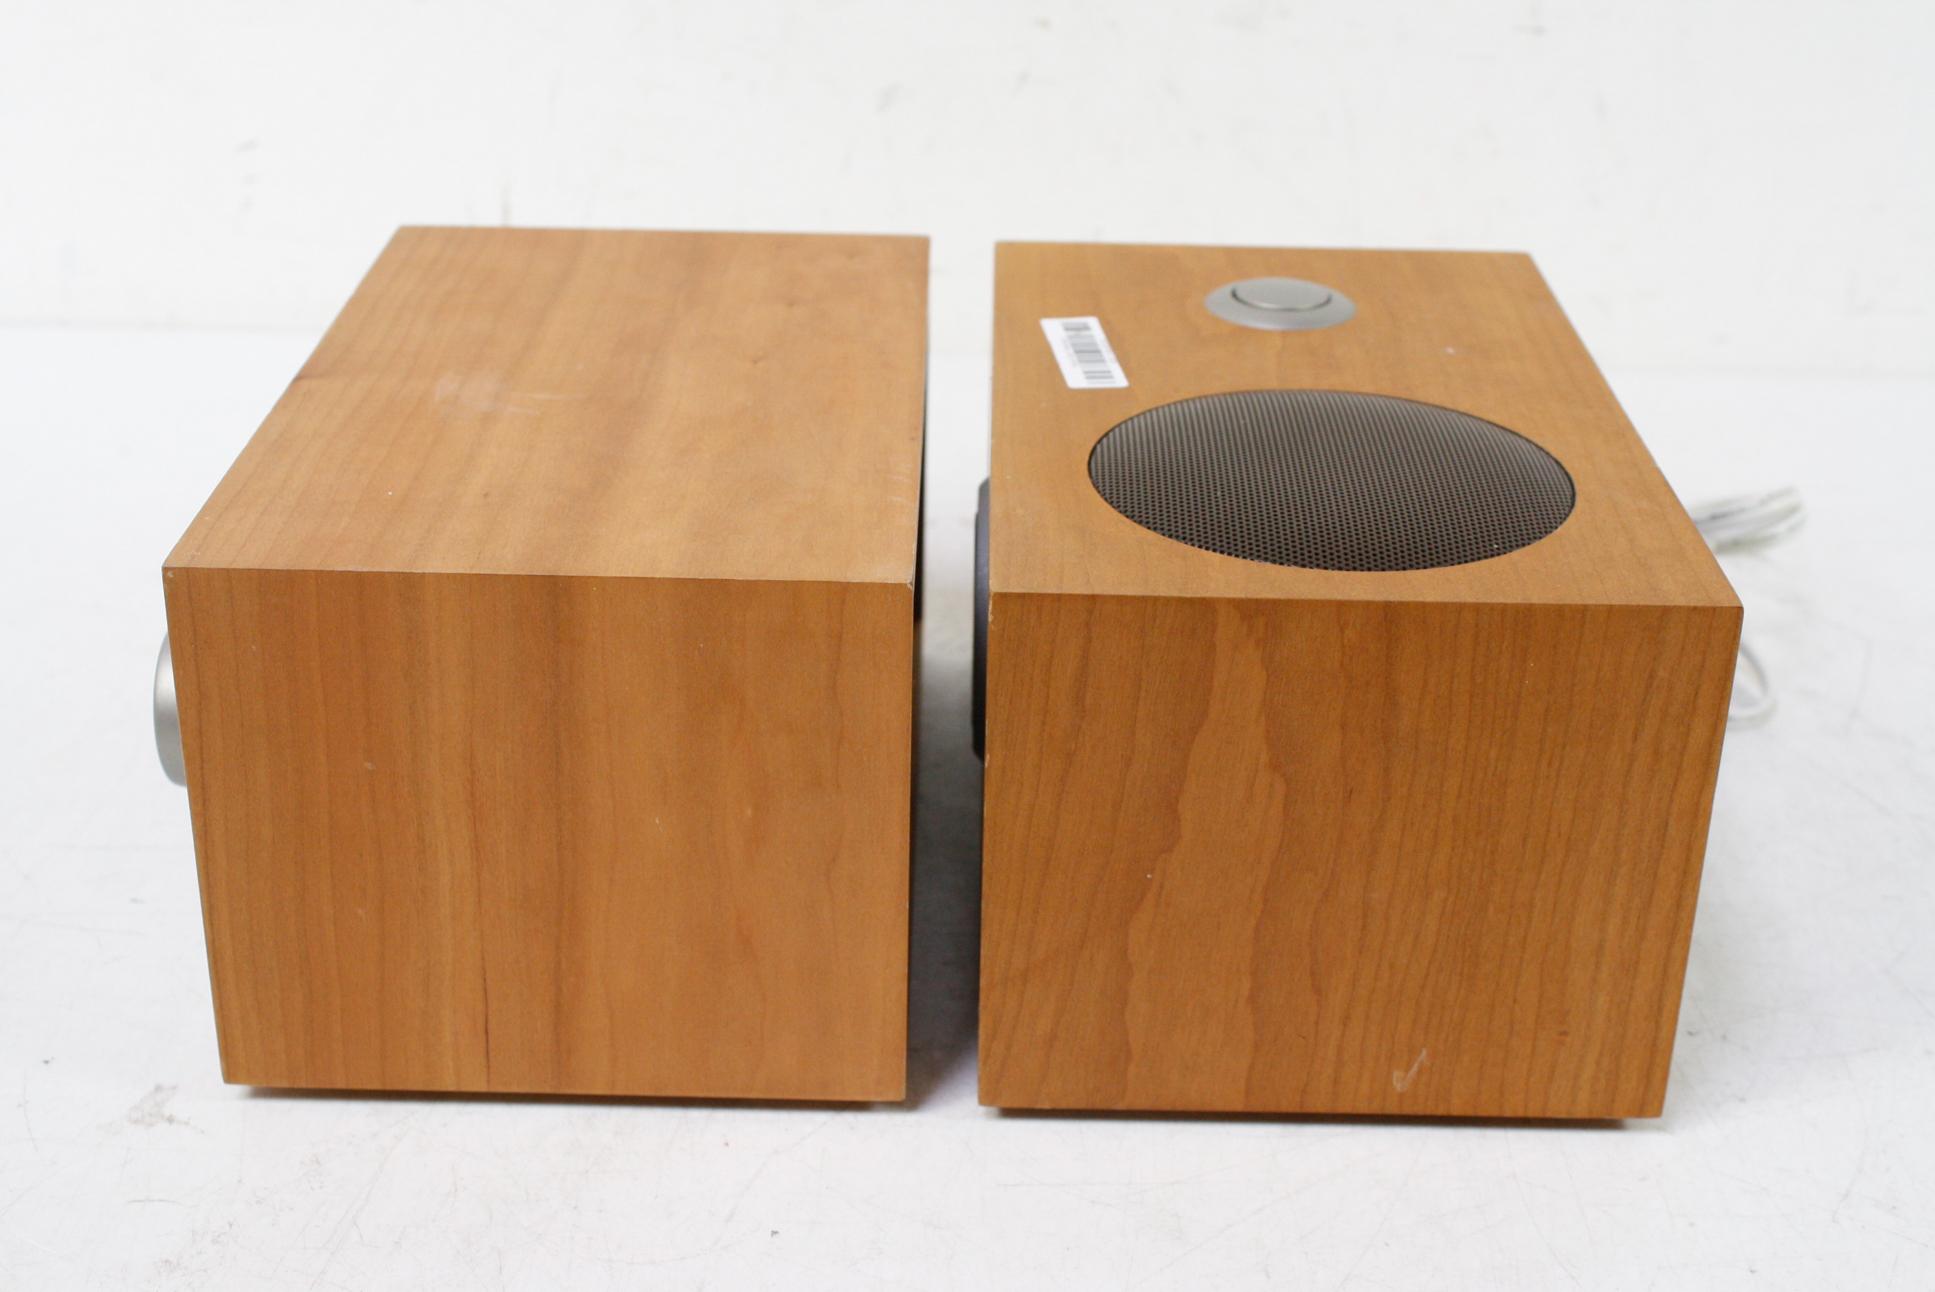 Tivoli Audio Model Two Dual Alarm Speaker Oak